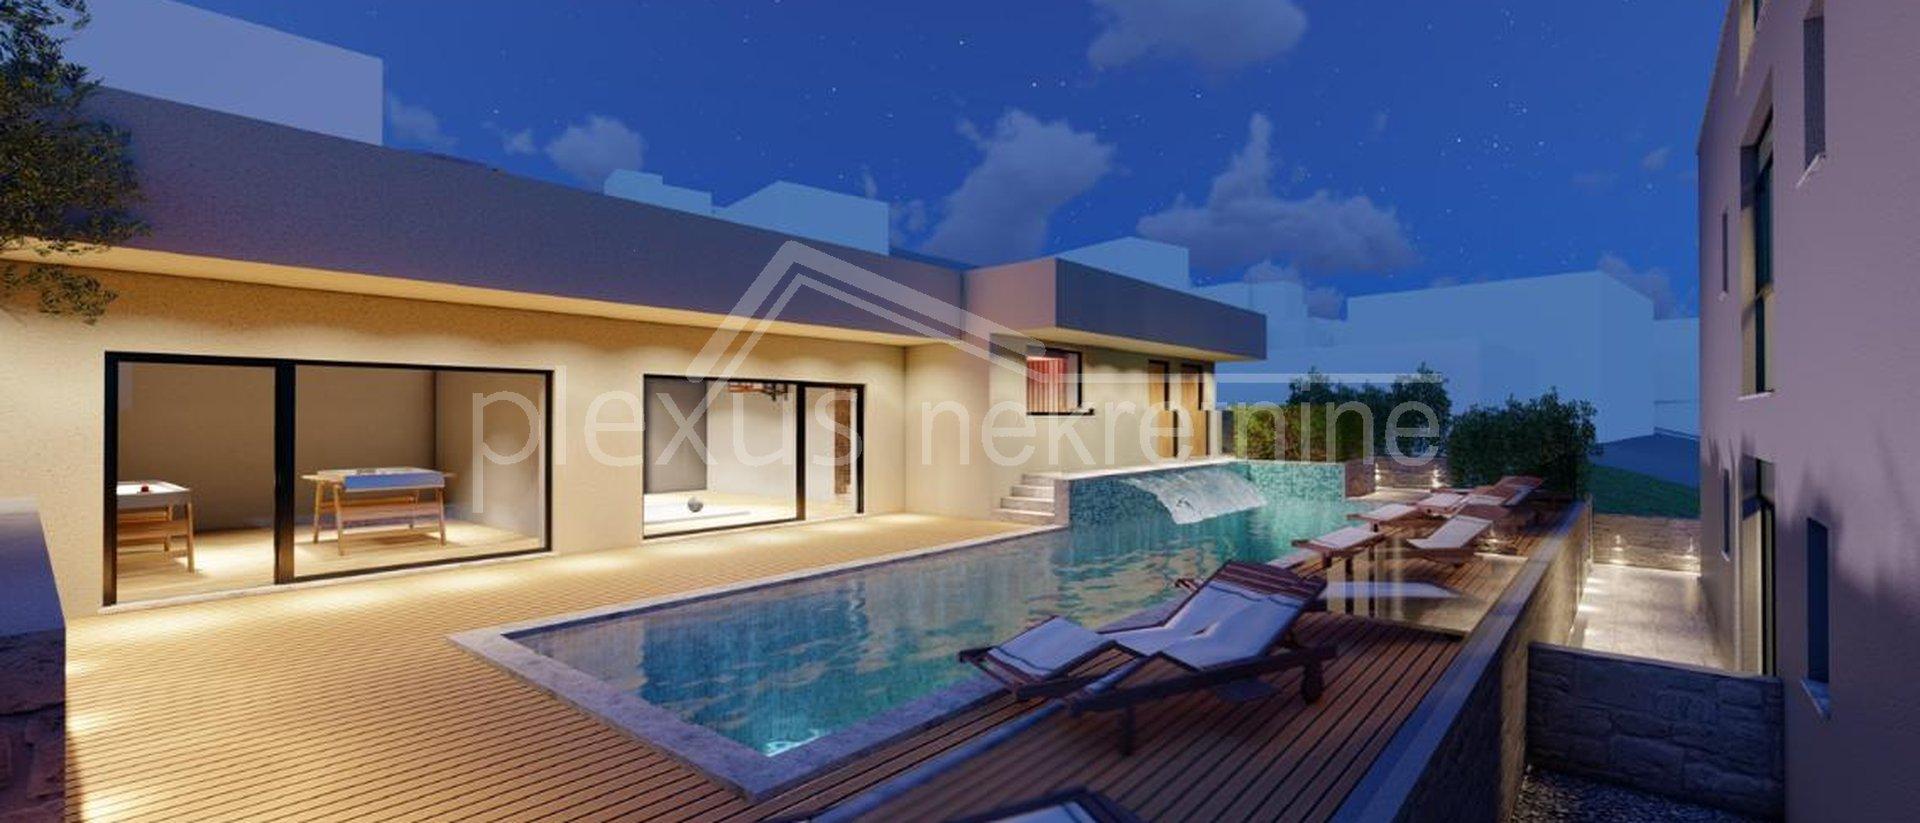 Appartamento, 128 m2, Vendita, Okrug - Okrug Gornji